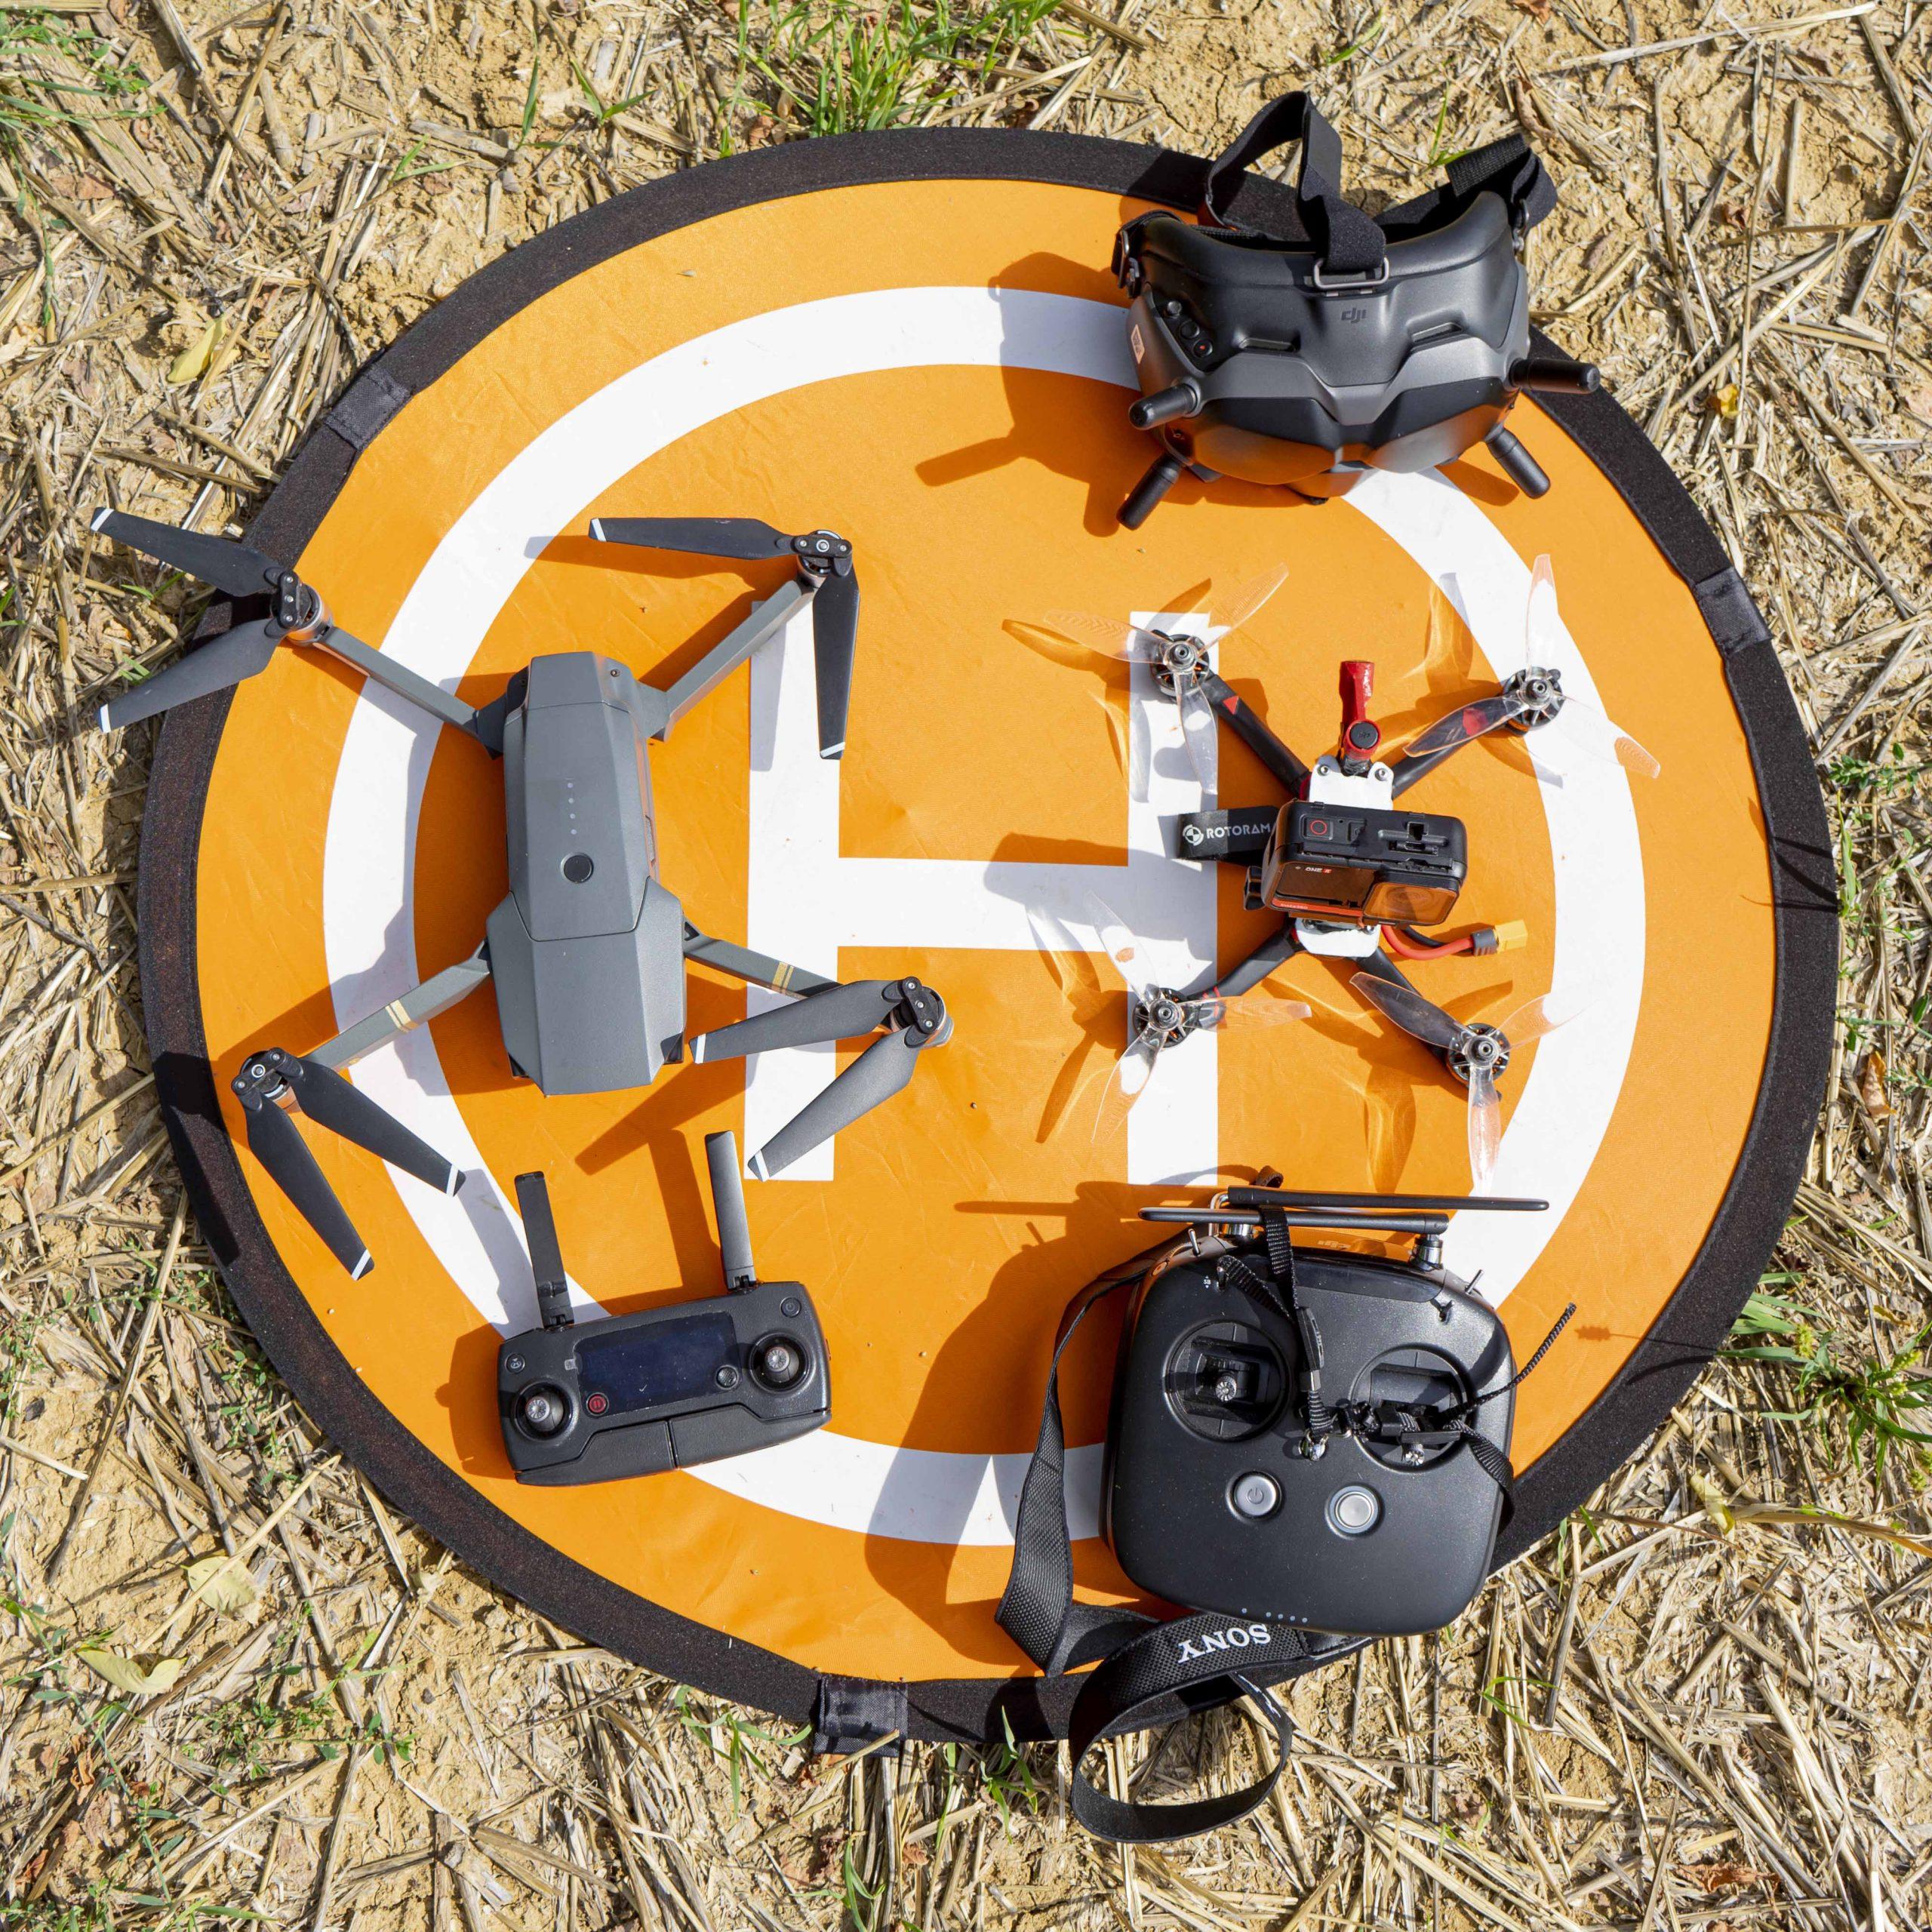 FPV dron